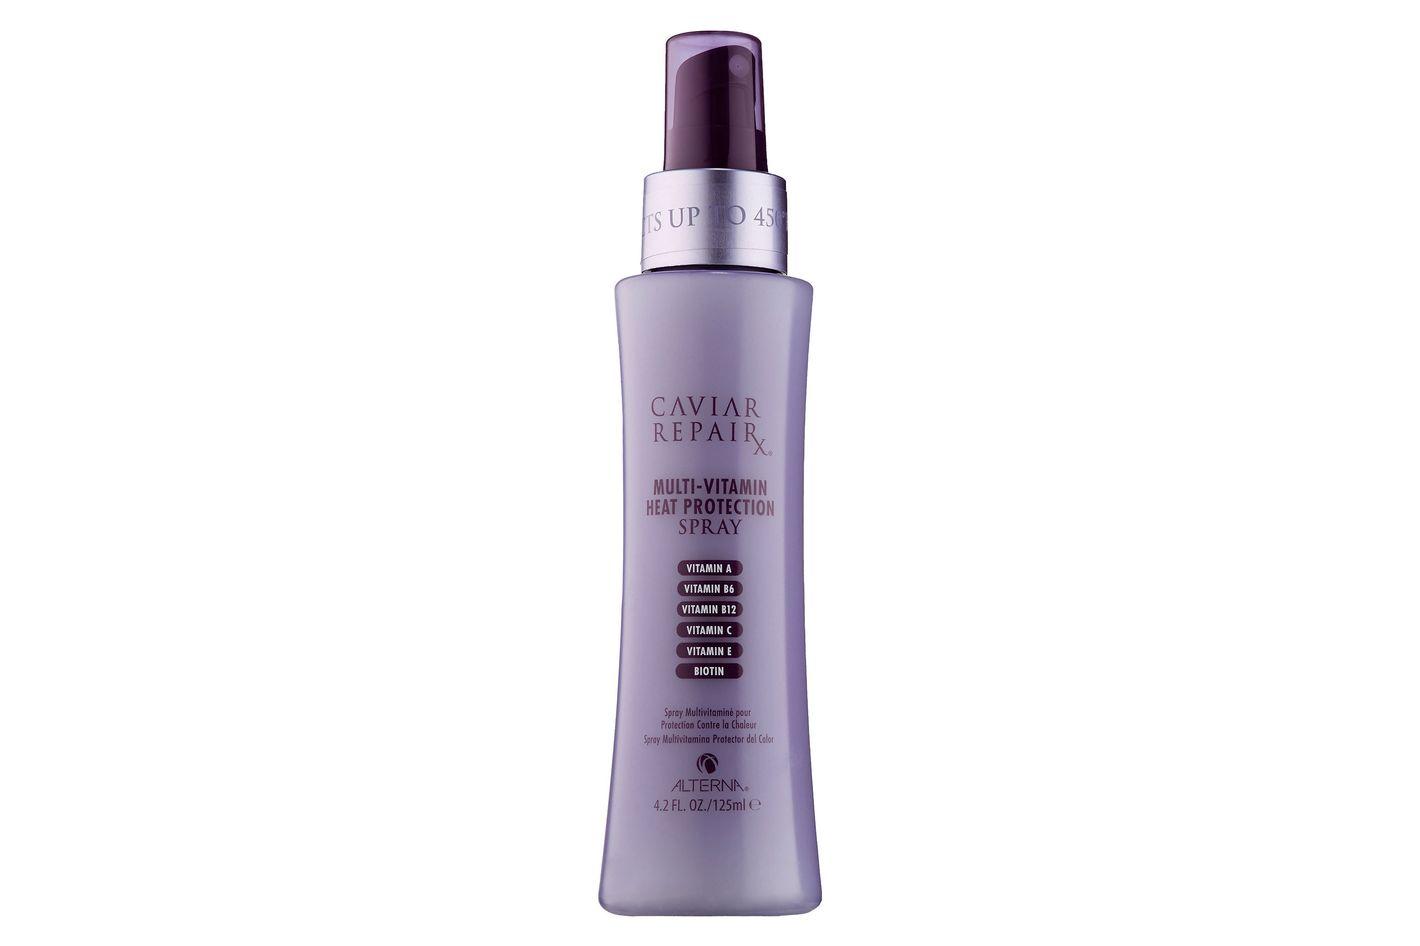 Alterna Haircare Caviar Repair Multi-Vitamin Heat Protection Spray